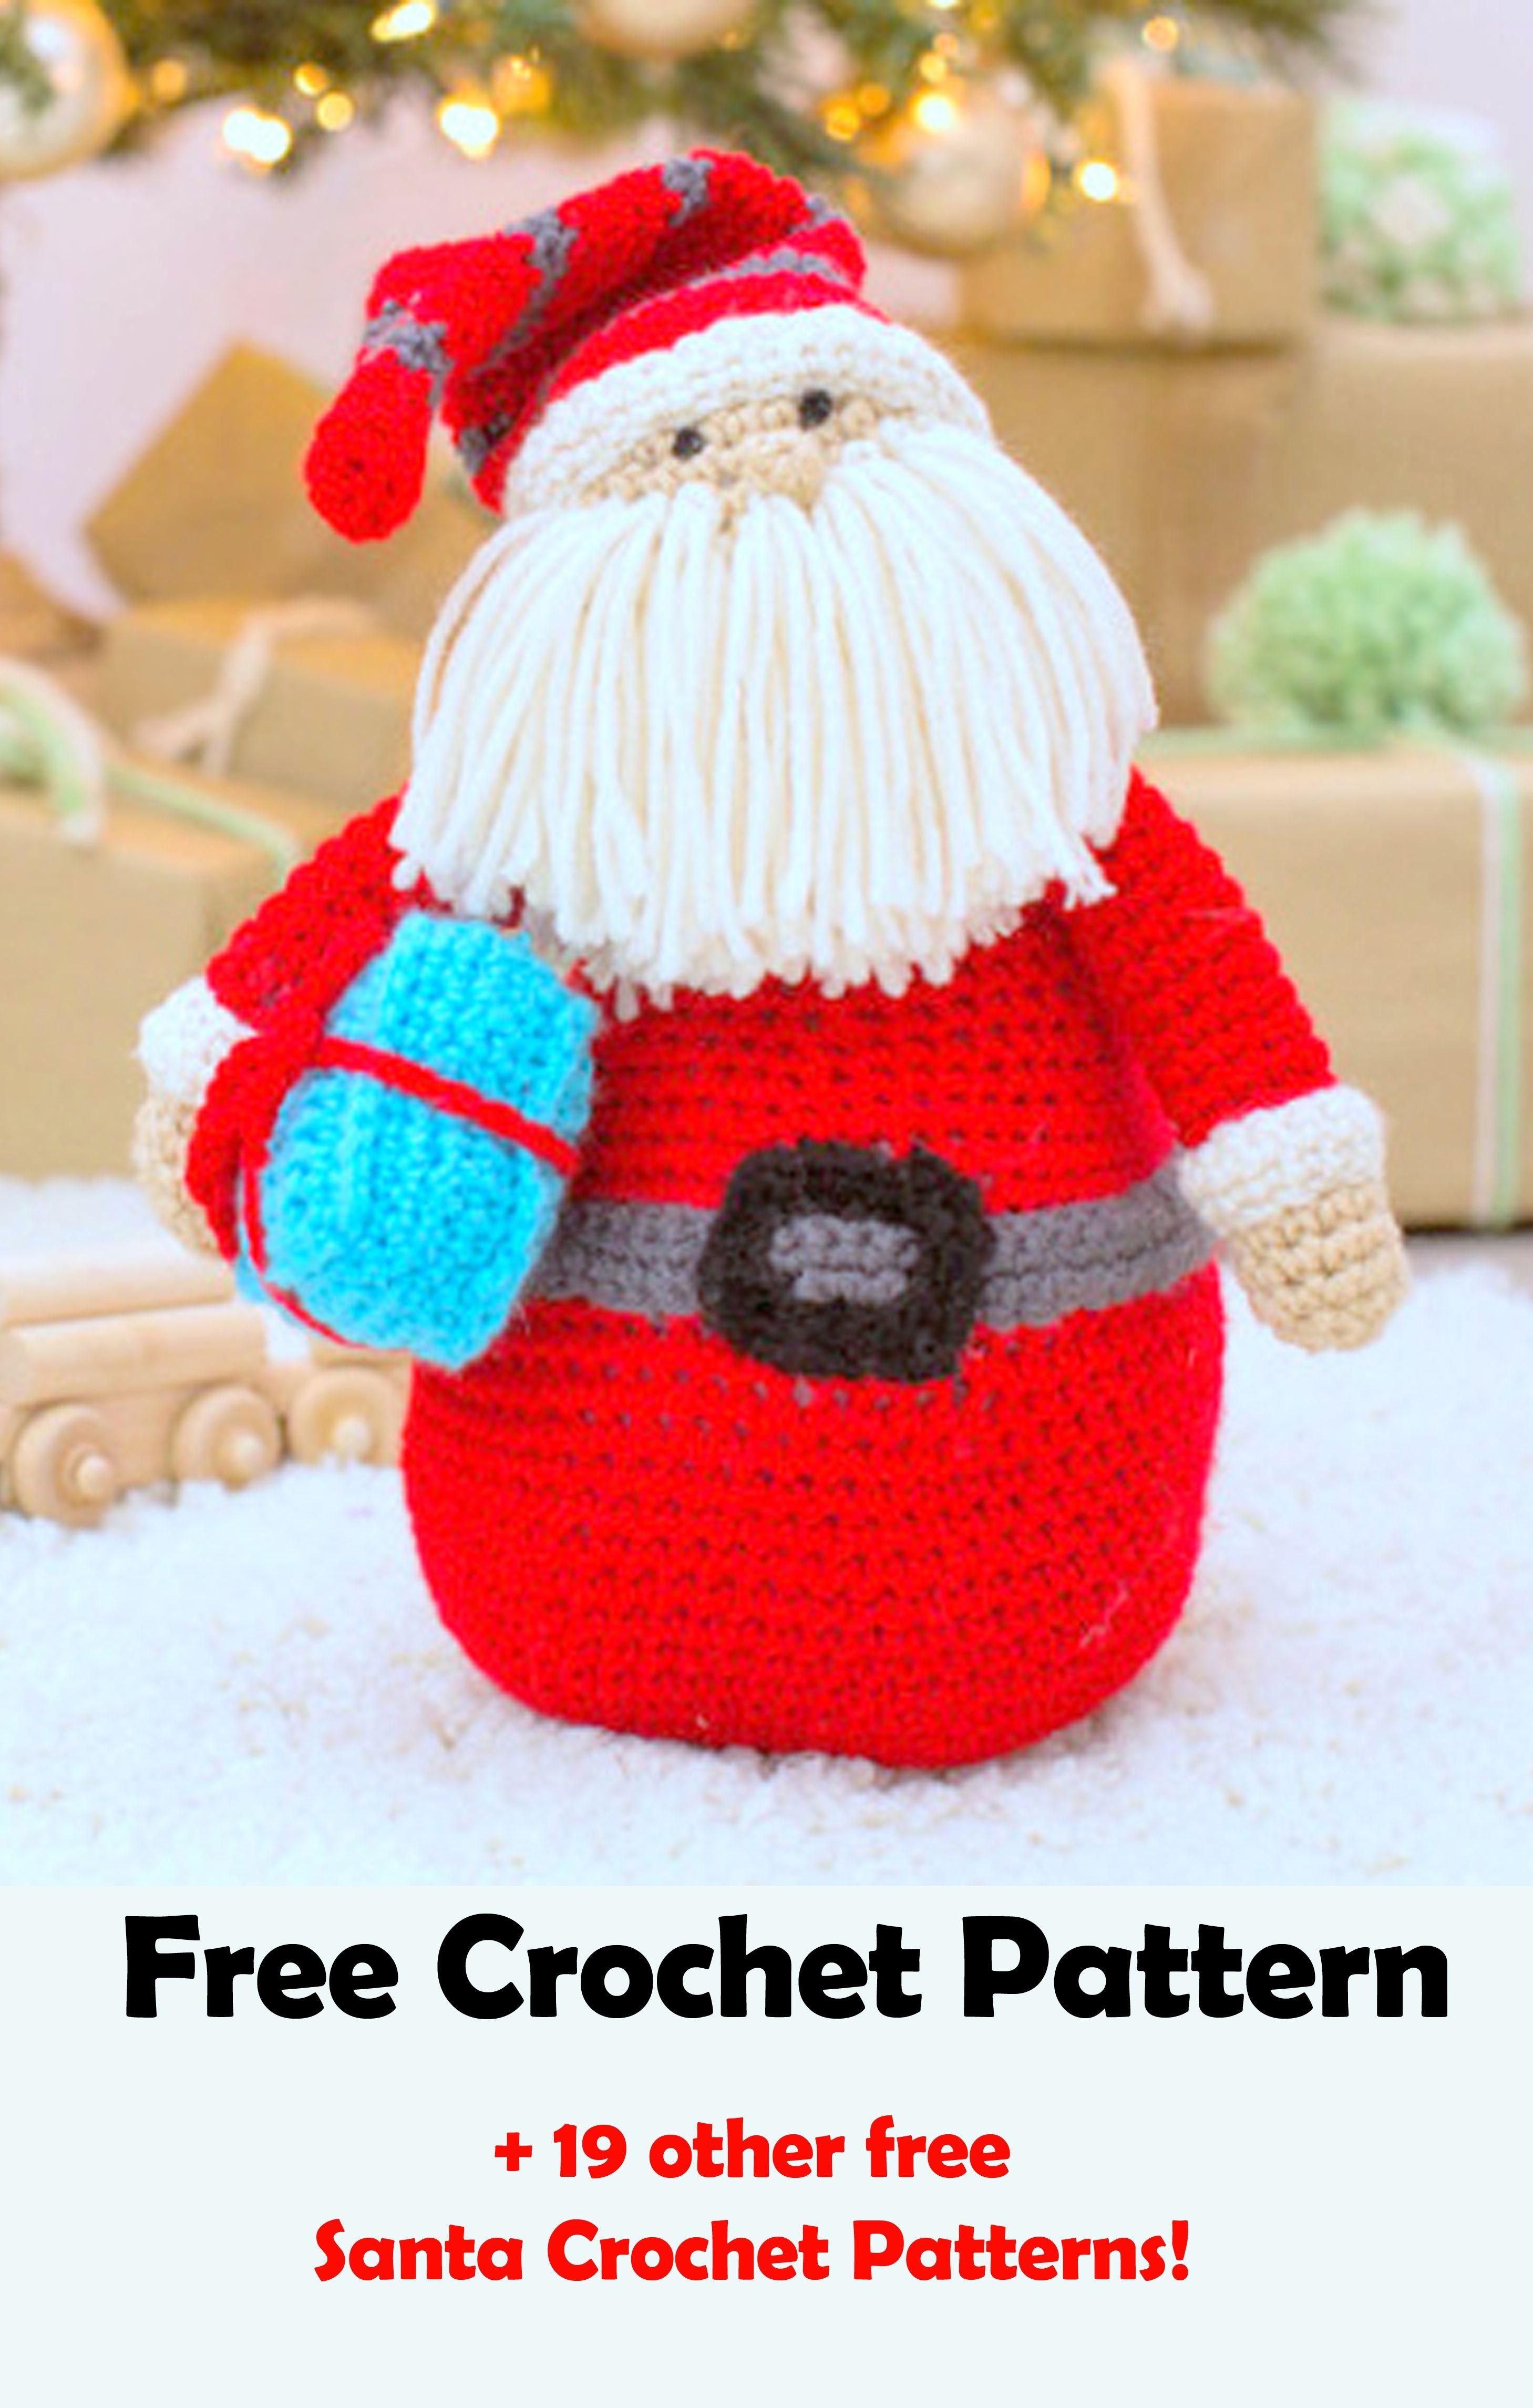 19 Free Amigurumi Christmas Santa Crochet Patterns | Amigurumi ...